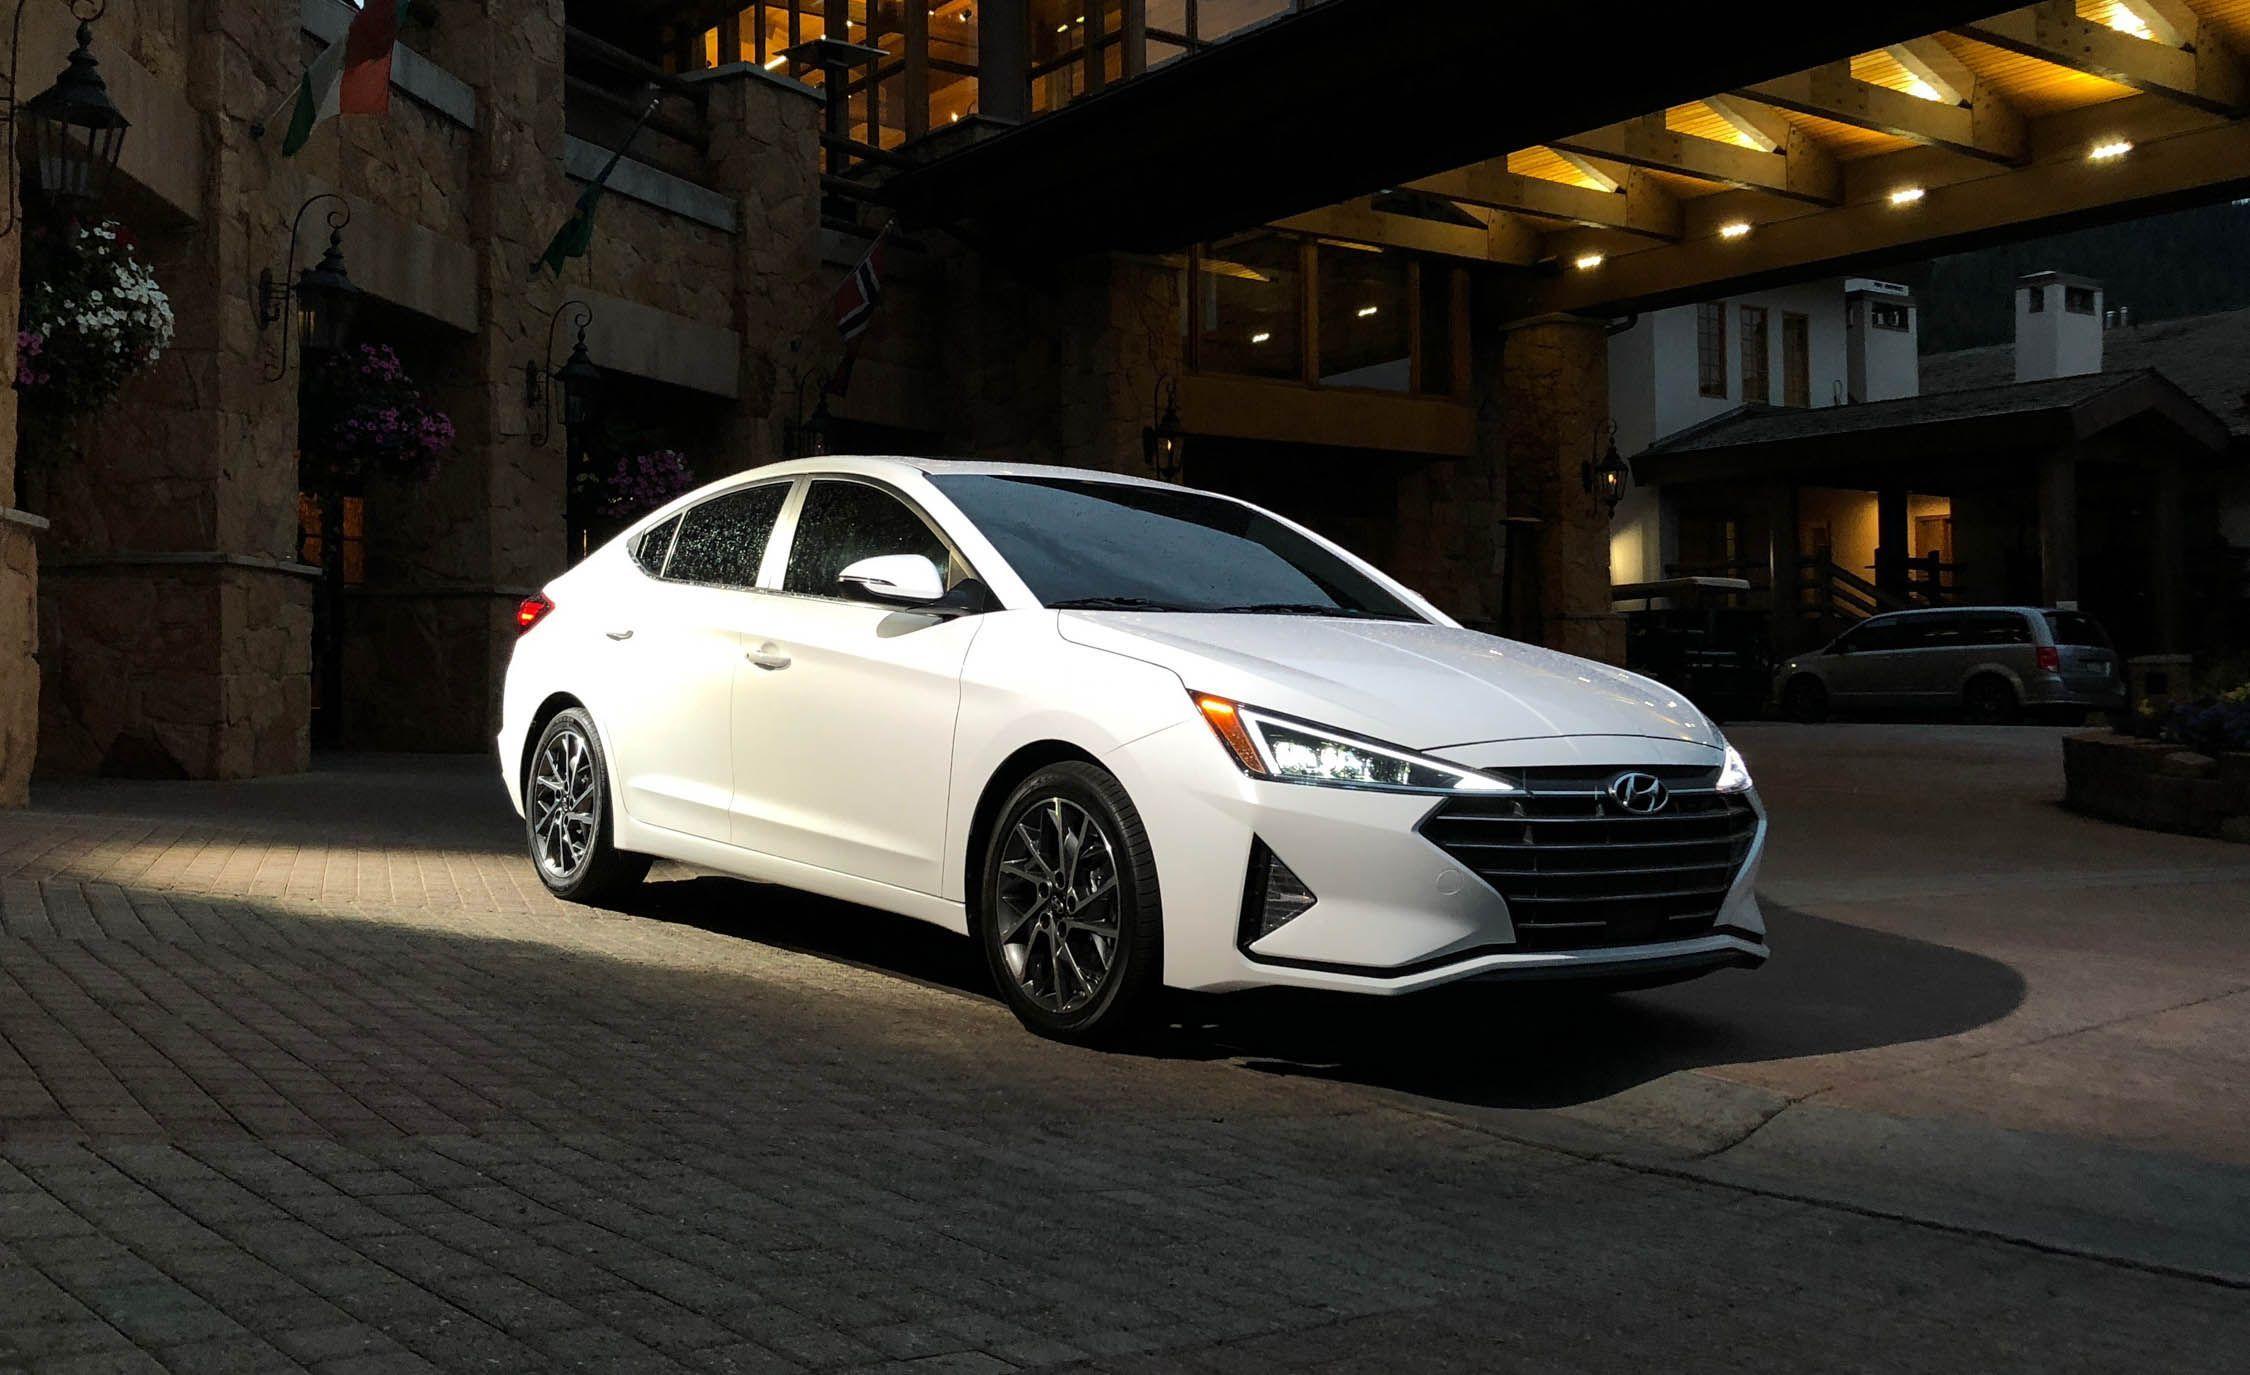 2019 Hyundai Elantra Reviews Hyundai Elantra Price Photos And